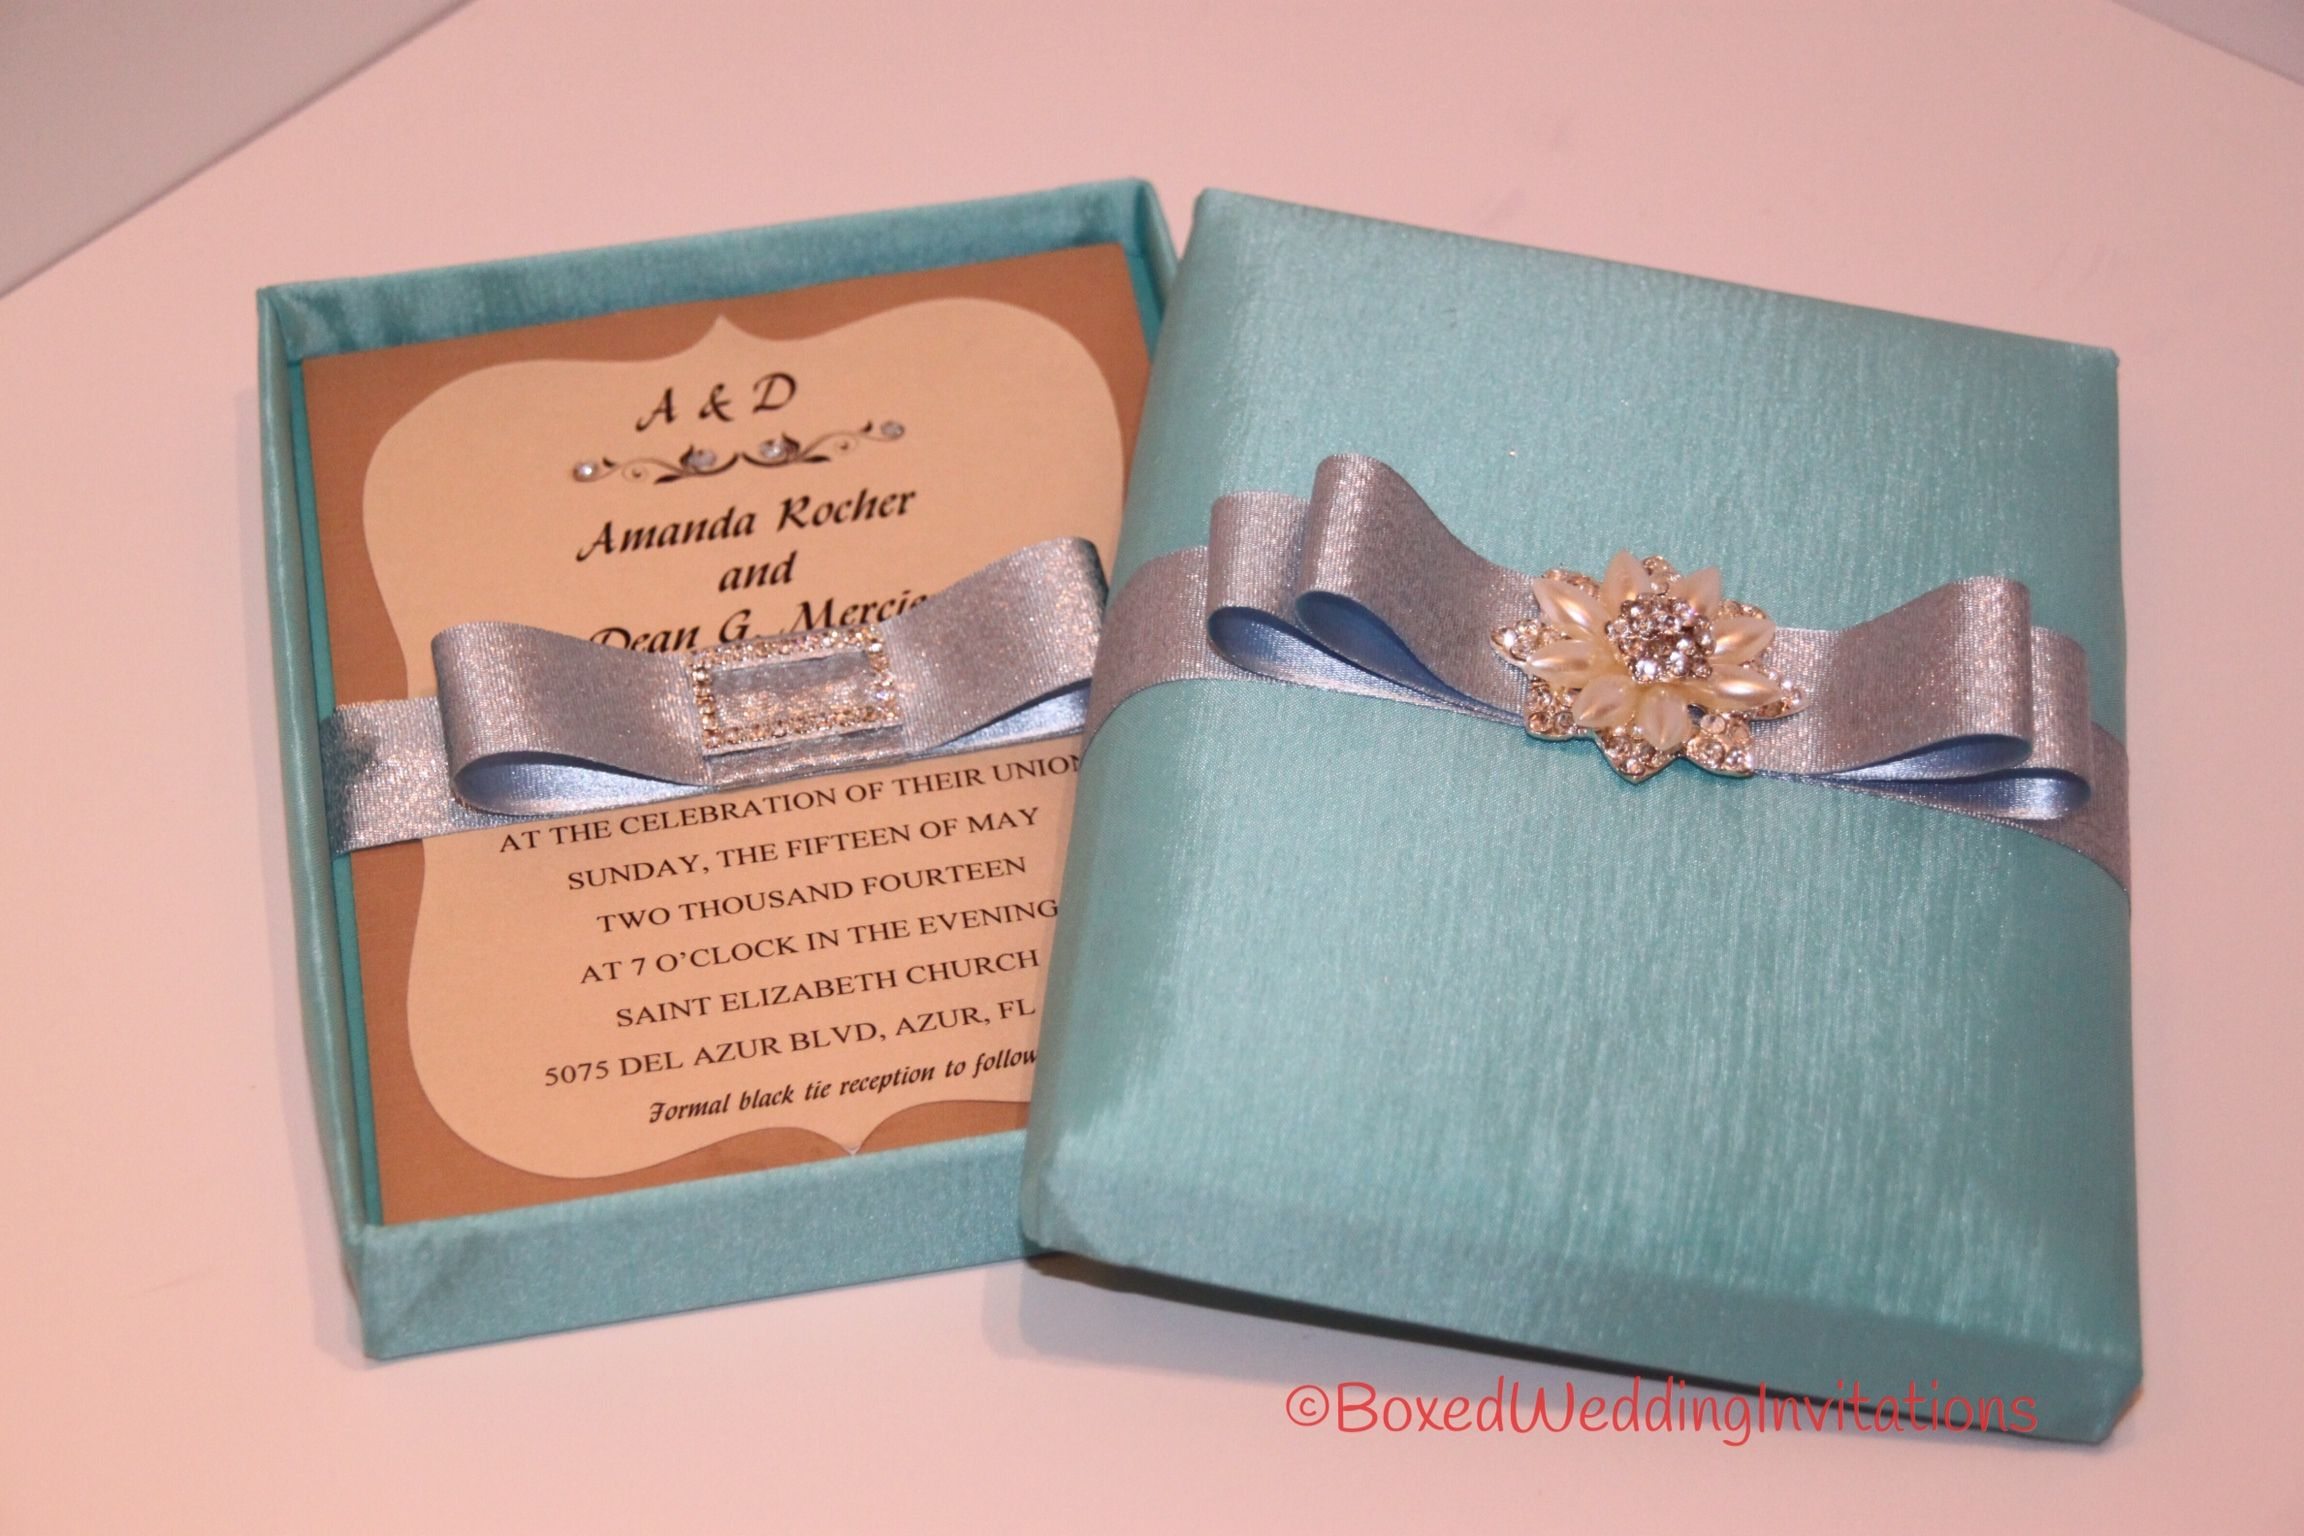 Beautiful azure invitations box perfect for a destination wedding beautiful azure invitations box perfect for a destination wedding wedding destinationwedding stopboris Images